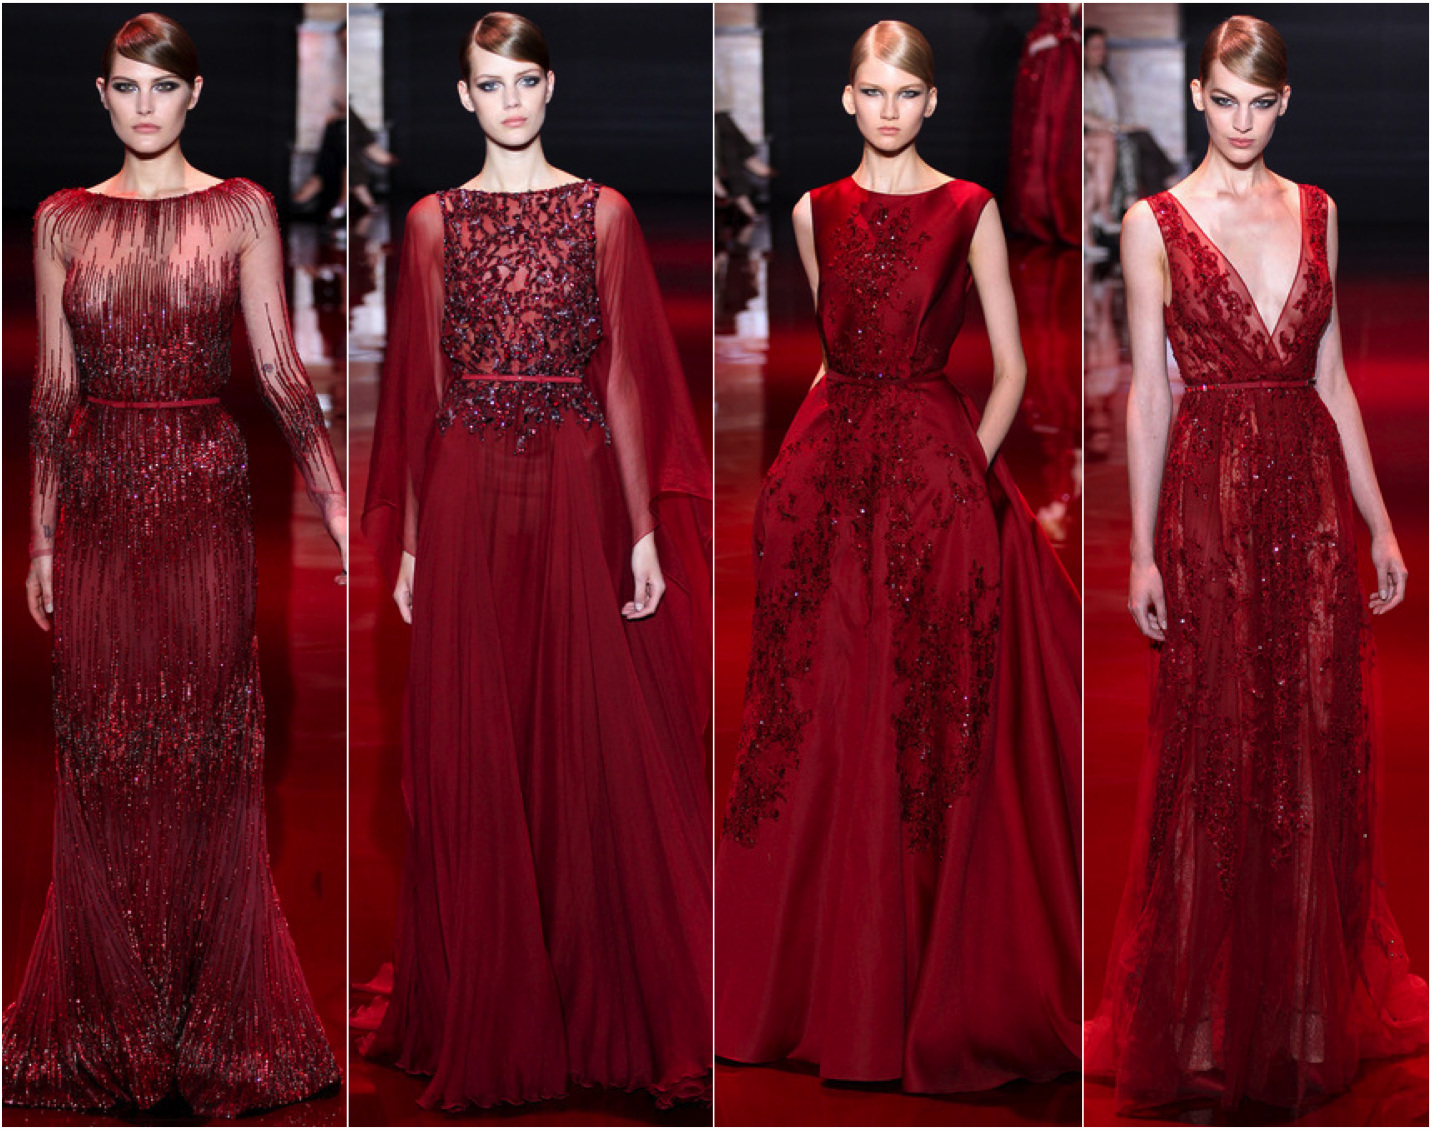 Elie Saab Alta Costura Divino Fashionismo